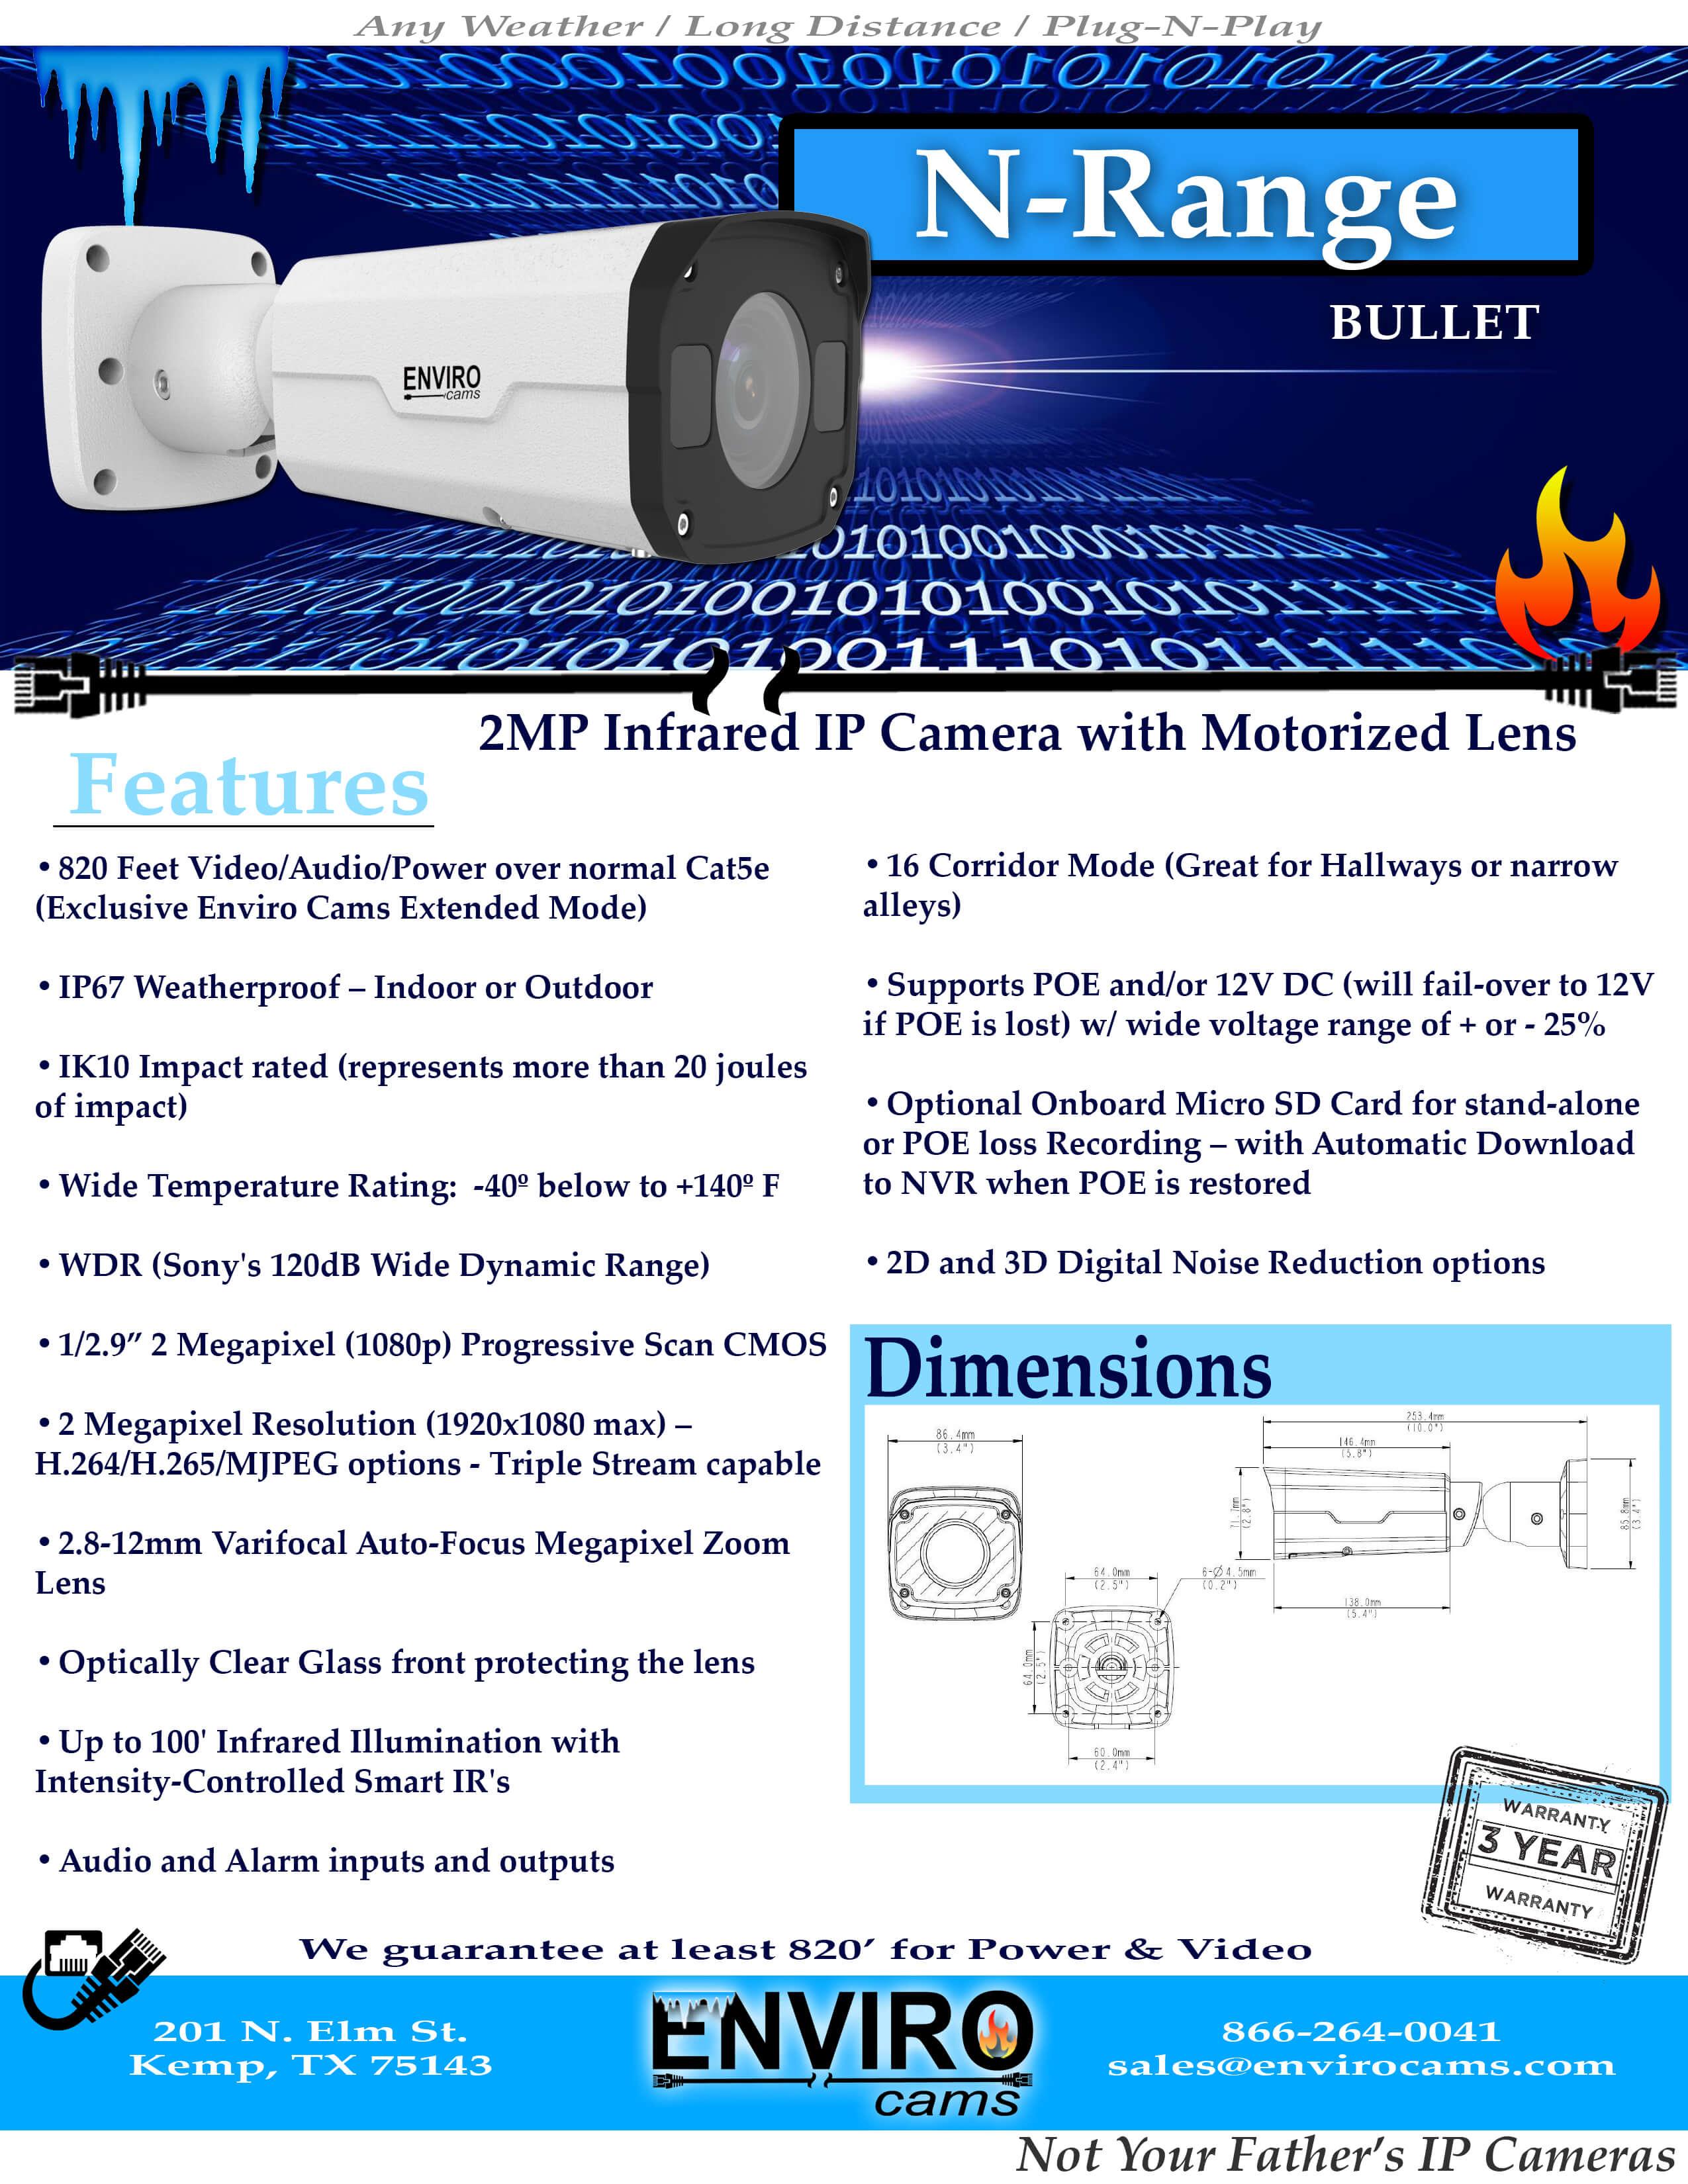 NRangeSpecPage1 - N-Range Bullet Camera